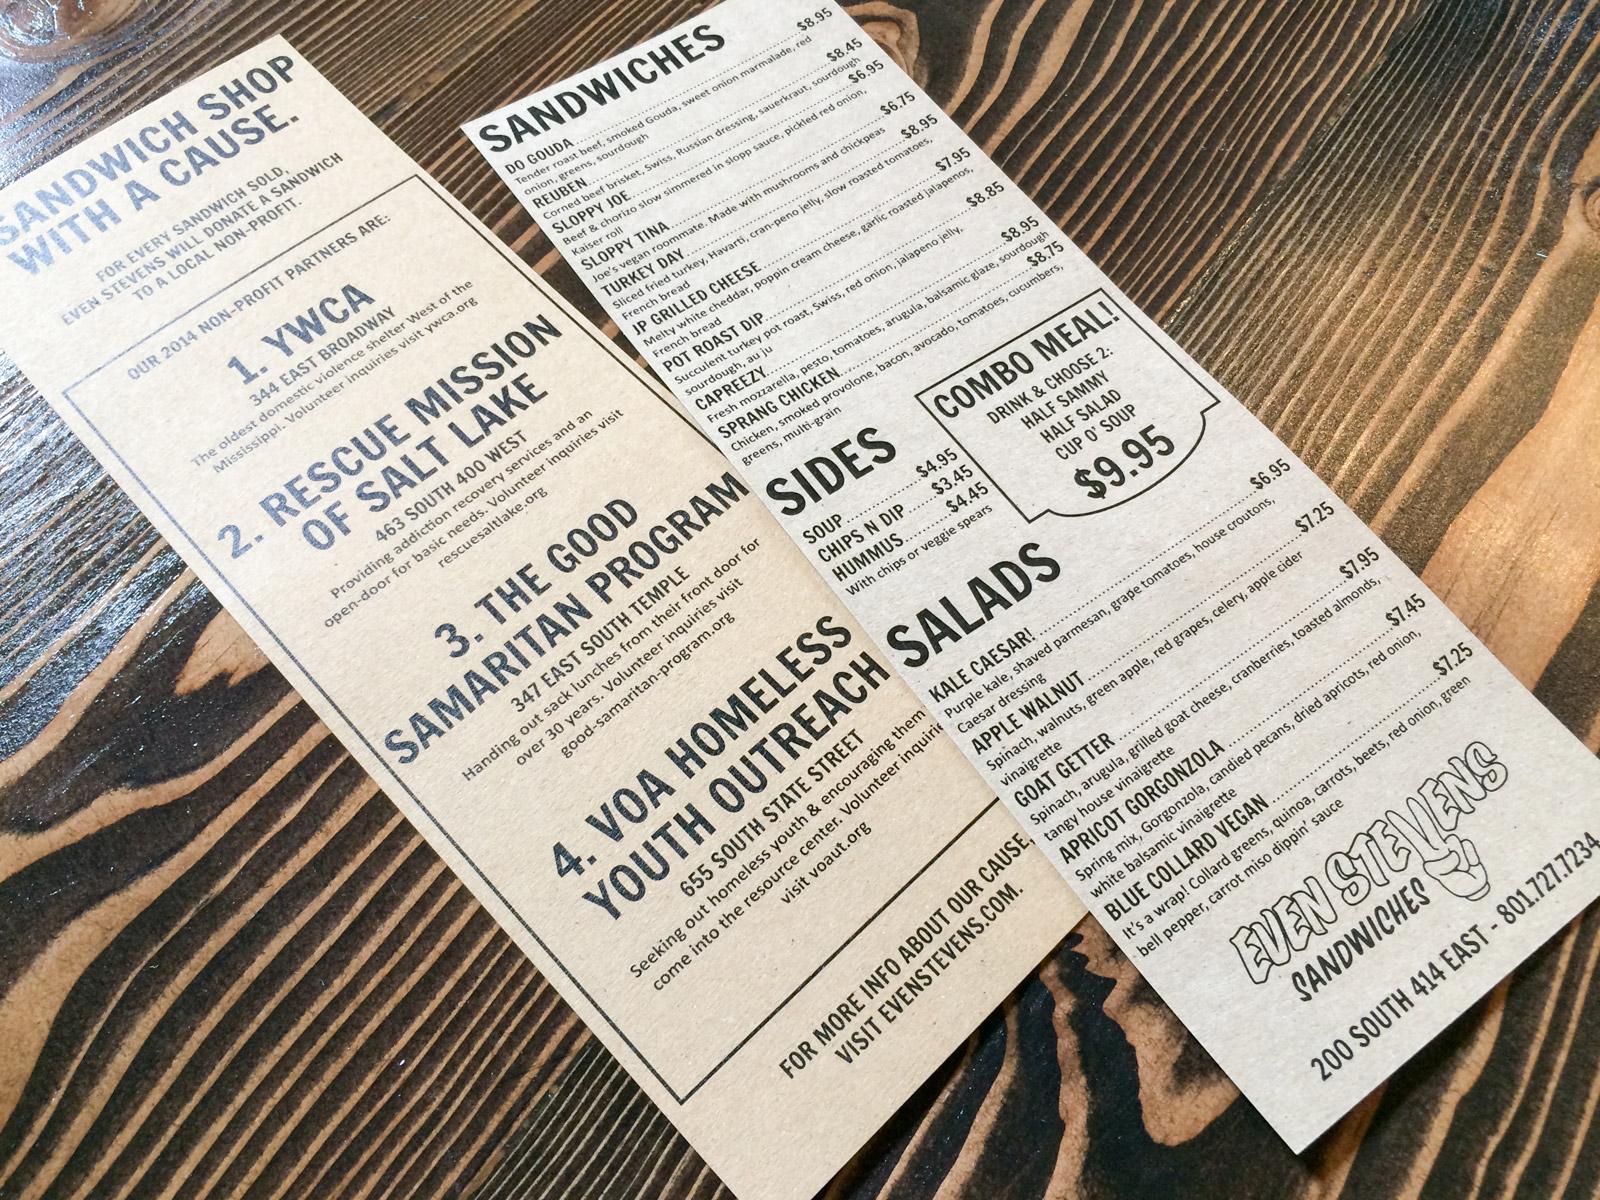 even-stevens-sandwich-shop-salt-lake-city-menu.jpg